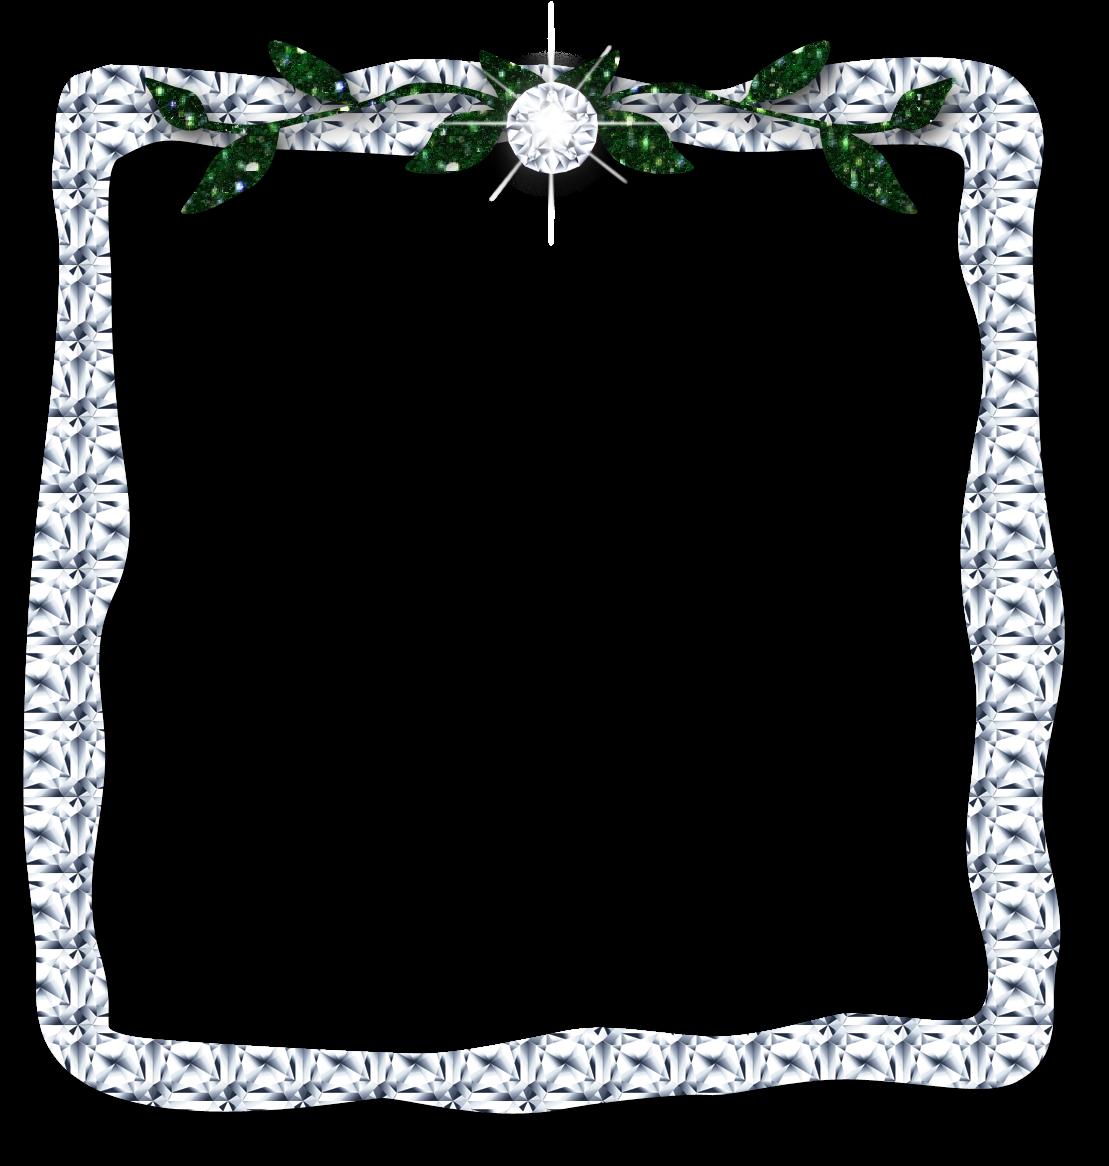 Diamond frame clipart clip art royalty free library Frame Clipart Diamond Leaves Digital Download Silver - Diamond ... clip art royalty free library